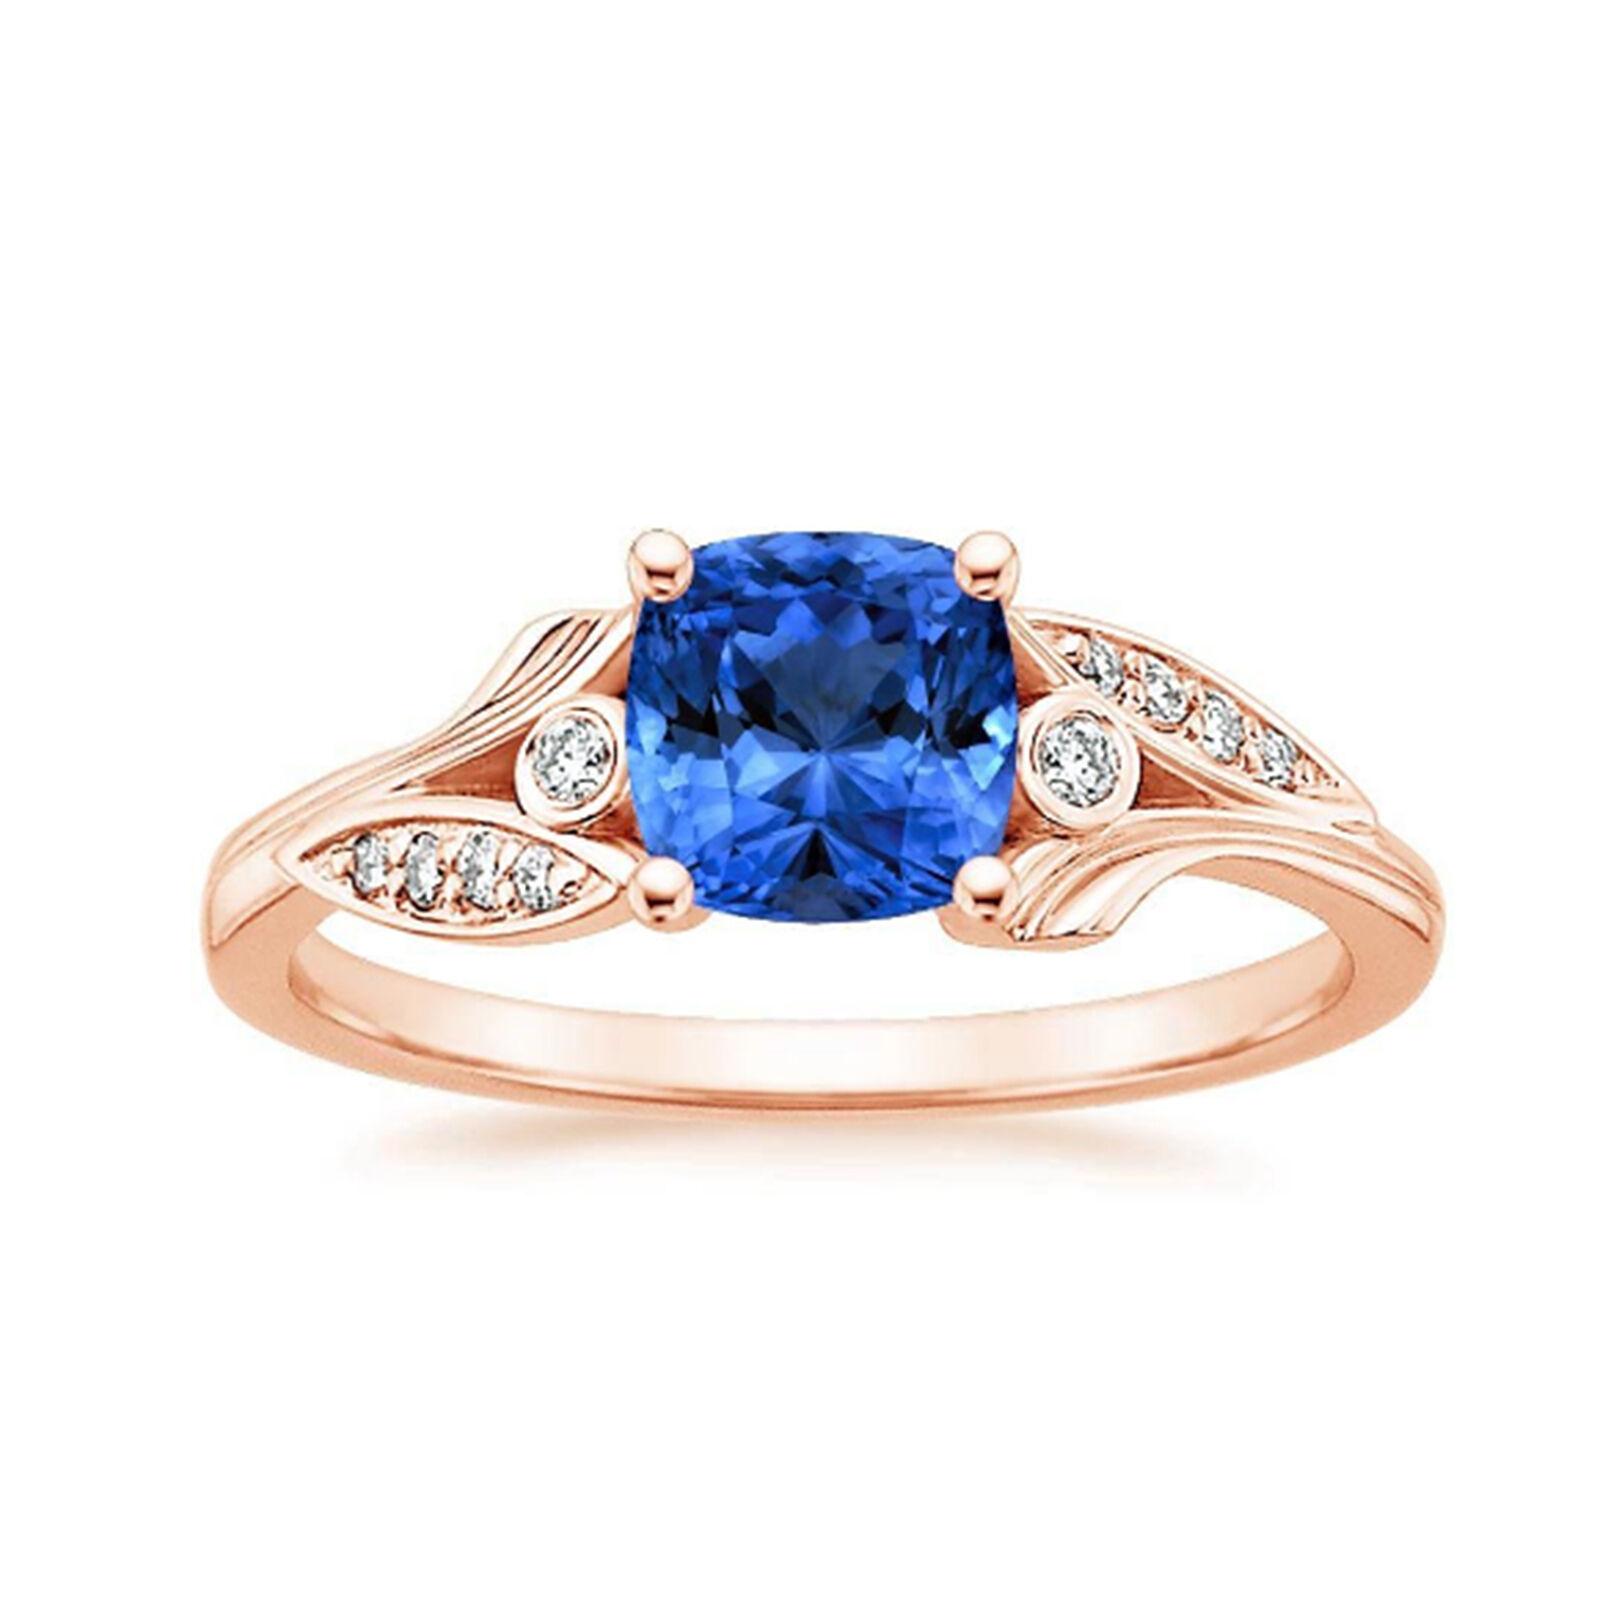 1.75ct Natural Sapphire Gemstone Diamond Engagement Rings 14k pink gold Ring